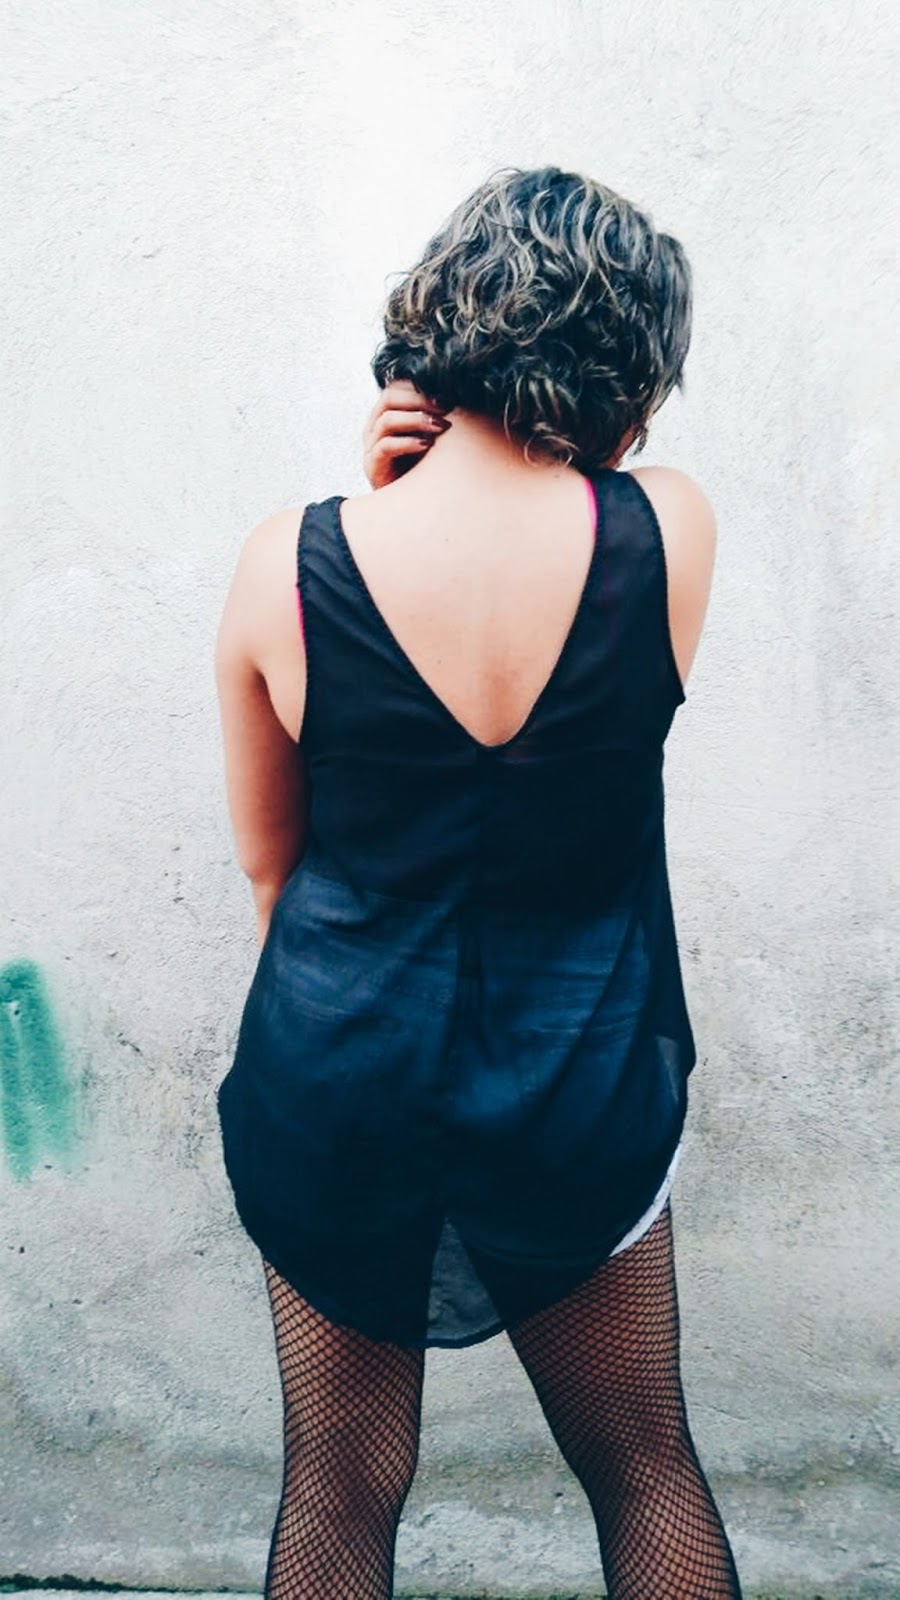 TRANSPARÊNCIA, STRAPPY BRA E JEANS | BLOG CONFIDENT POR LETÍCIA CAETANO